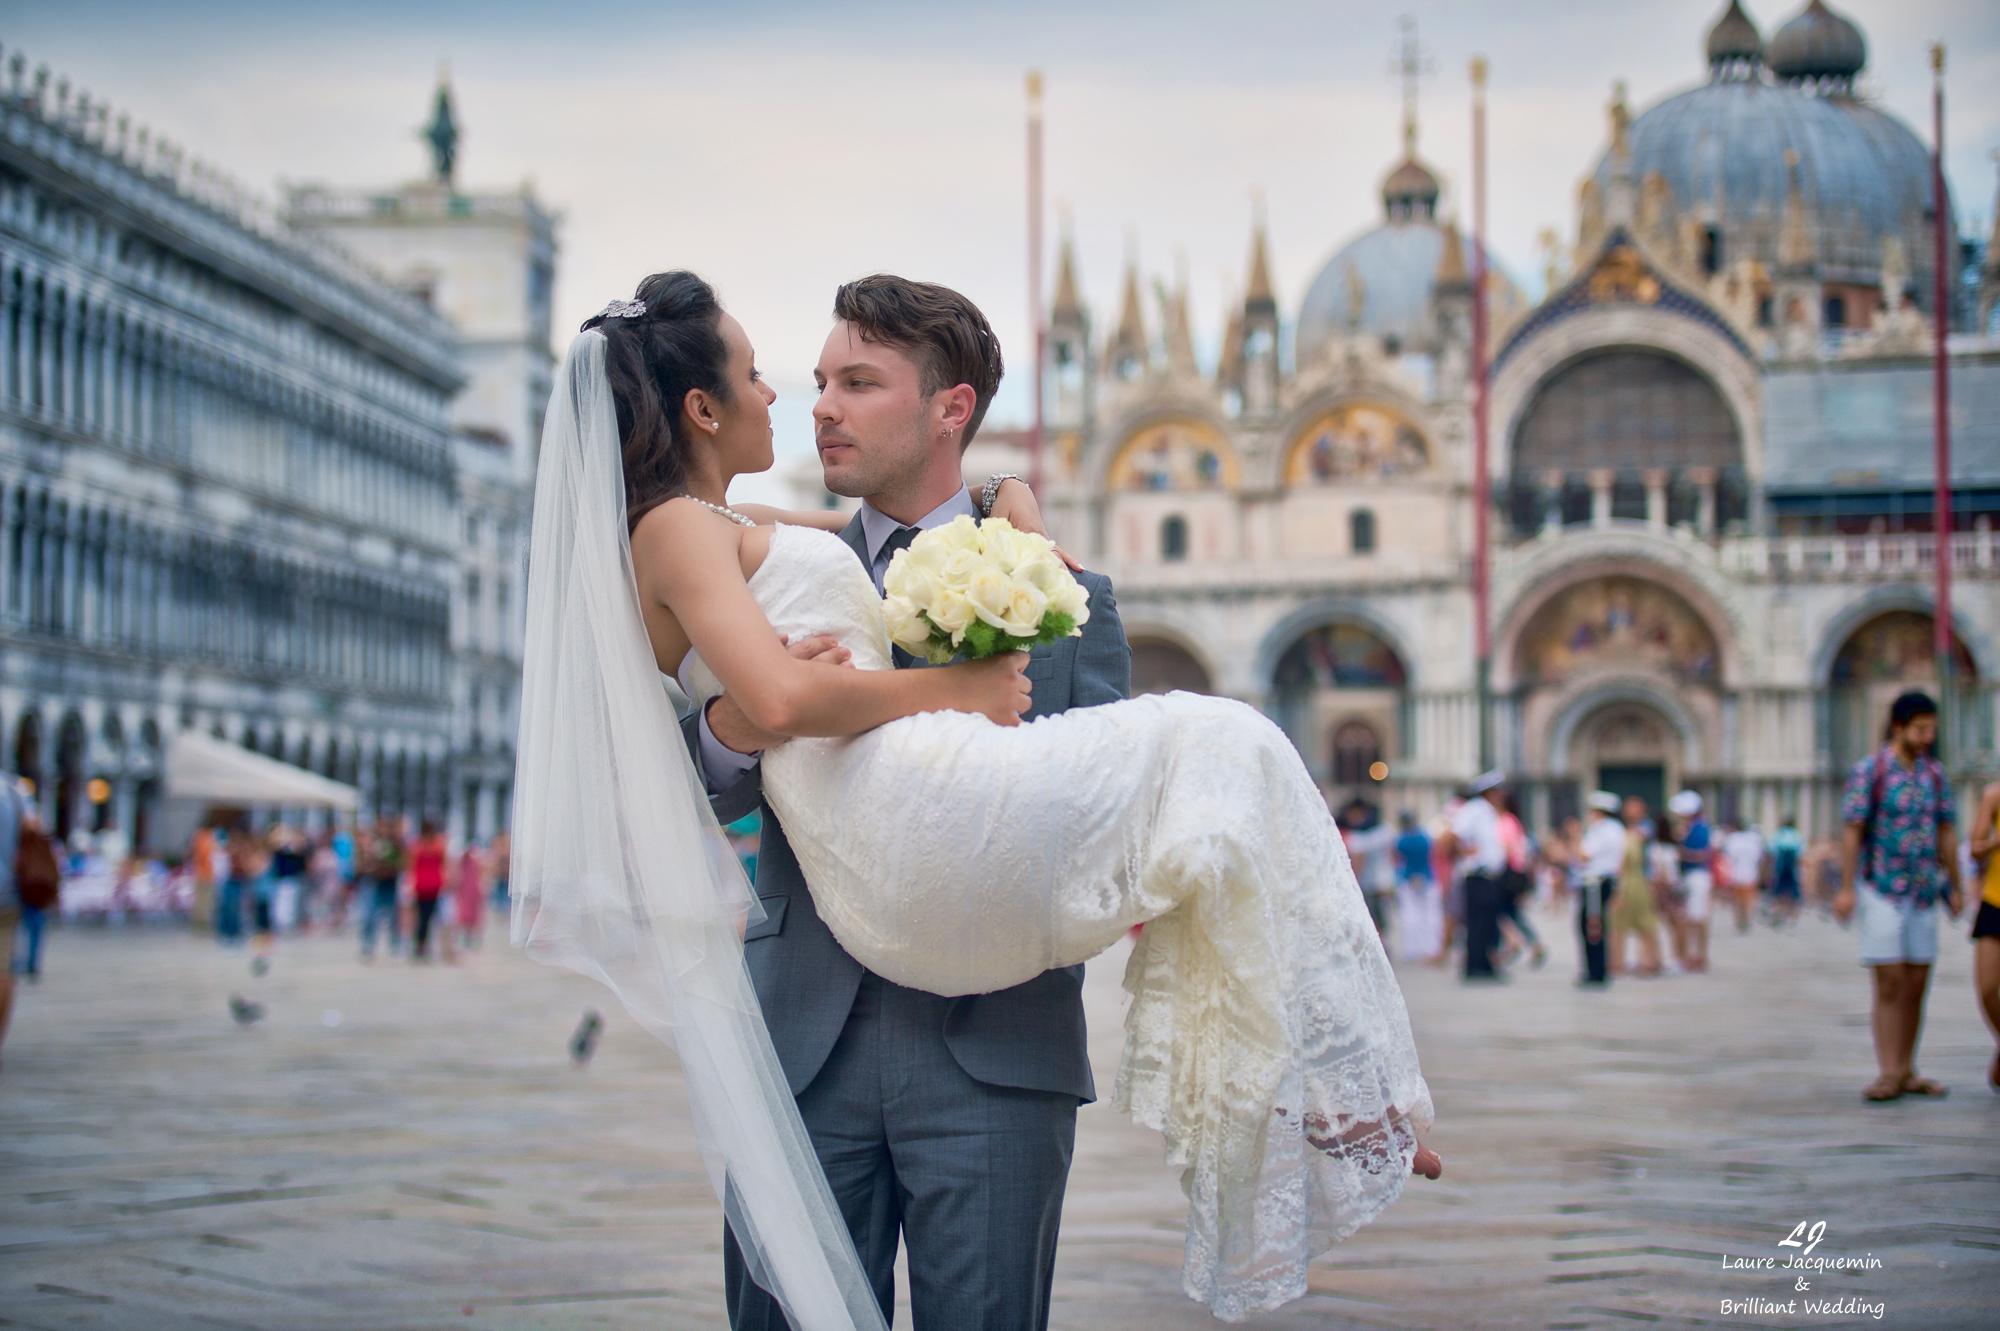 Venice Simbolic Wedding gondola venice Italy laure jacquemin photography (92) copia